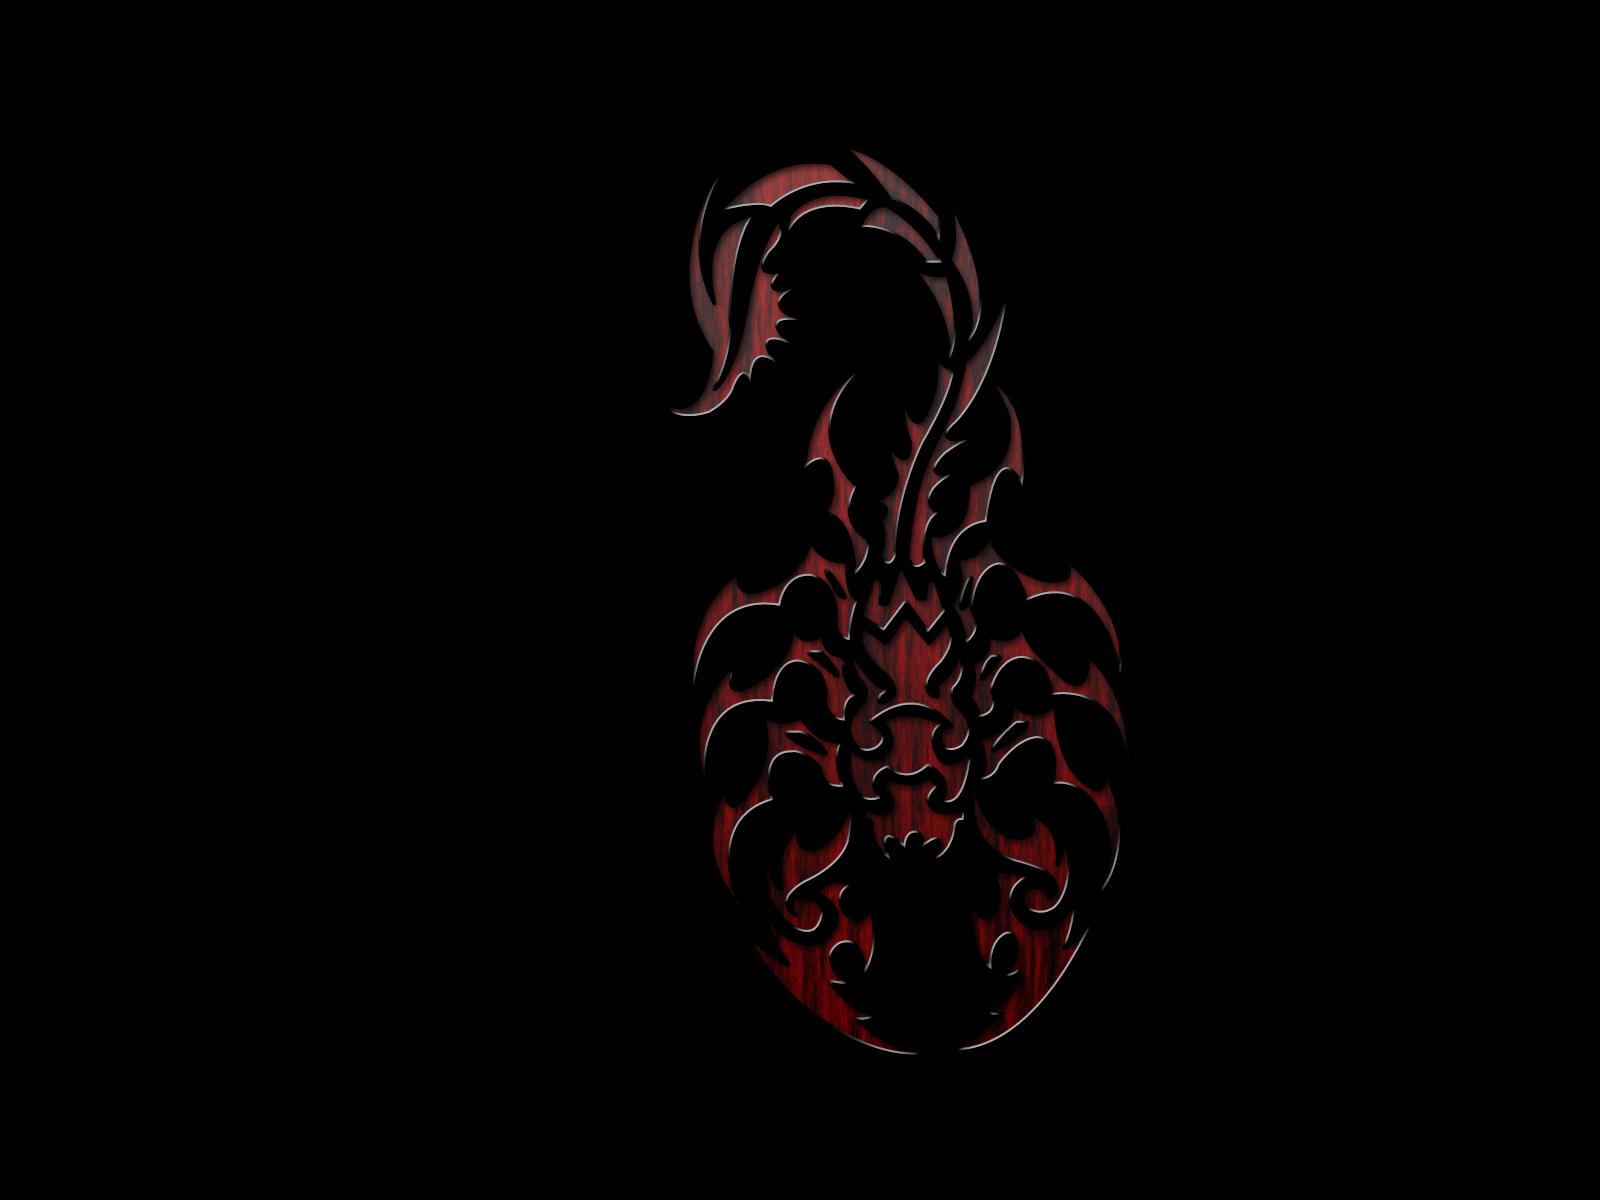 Крутые картинки со скорпионом